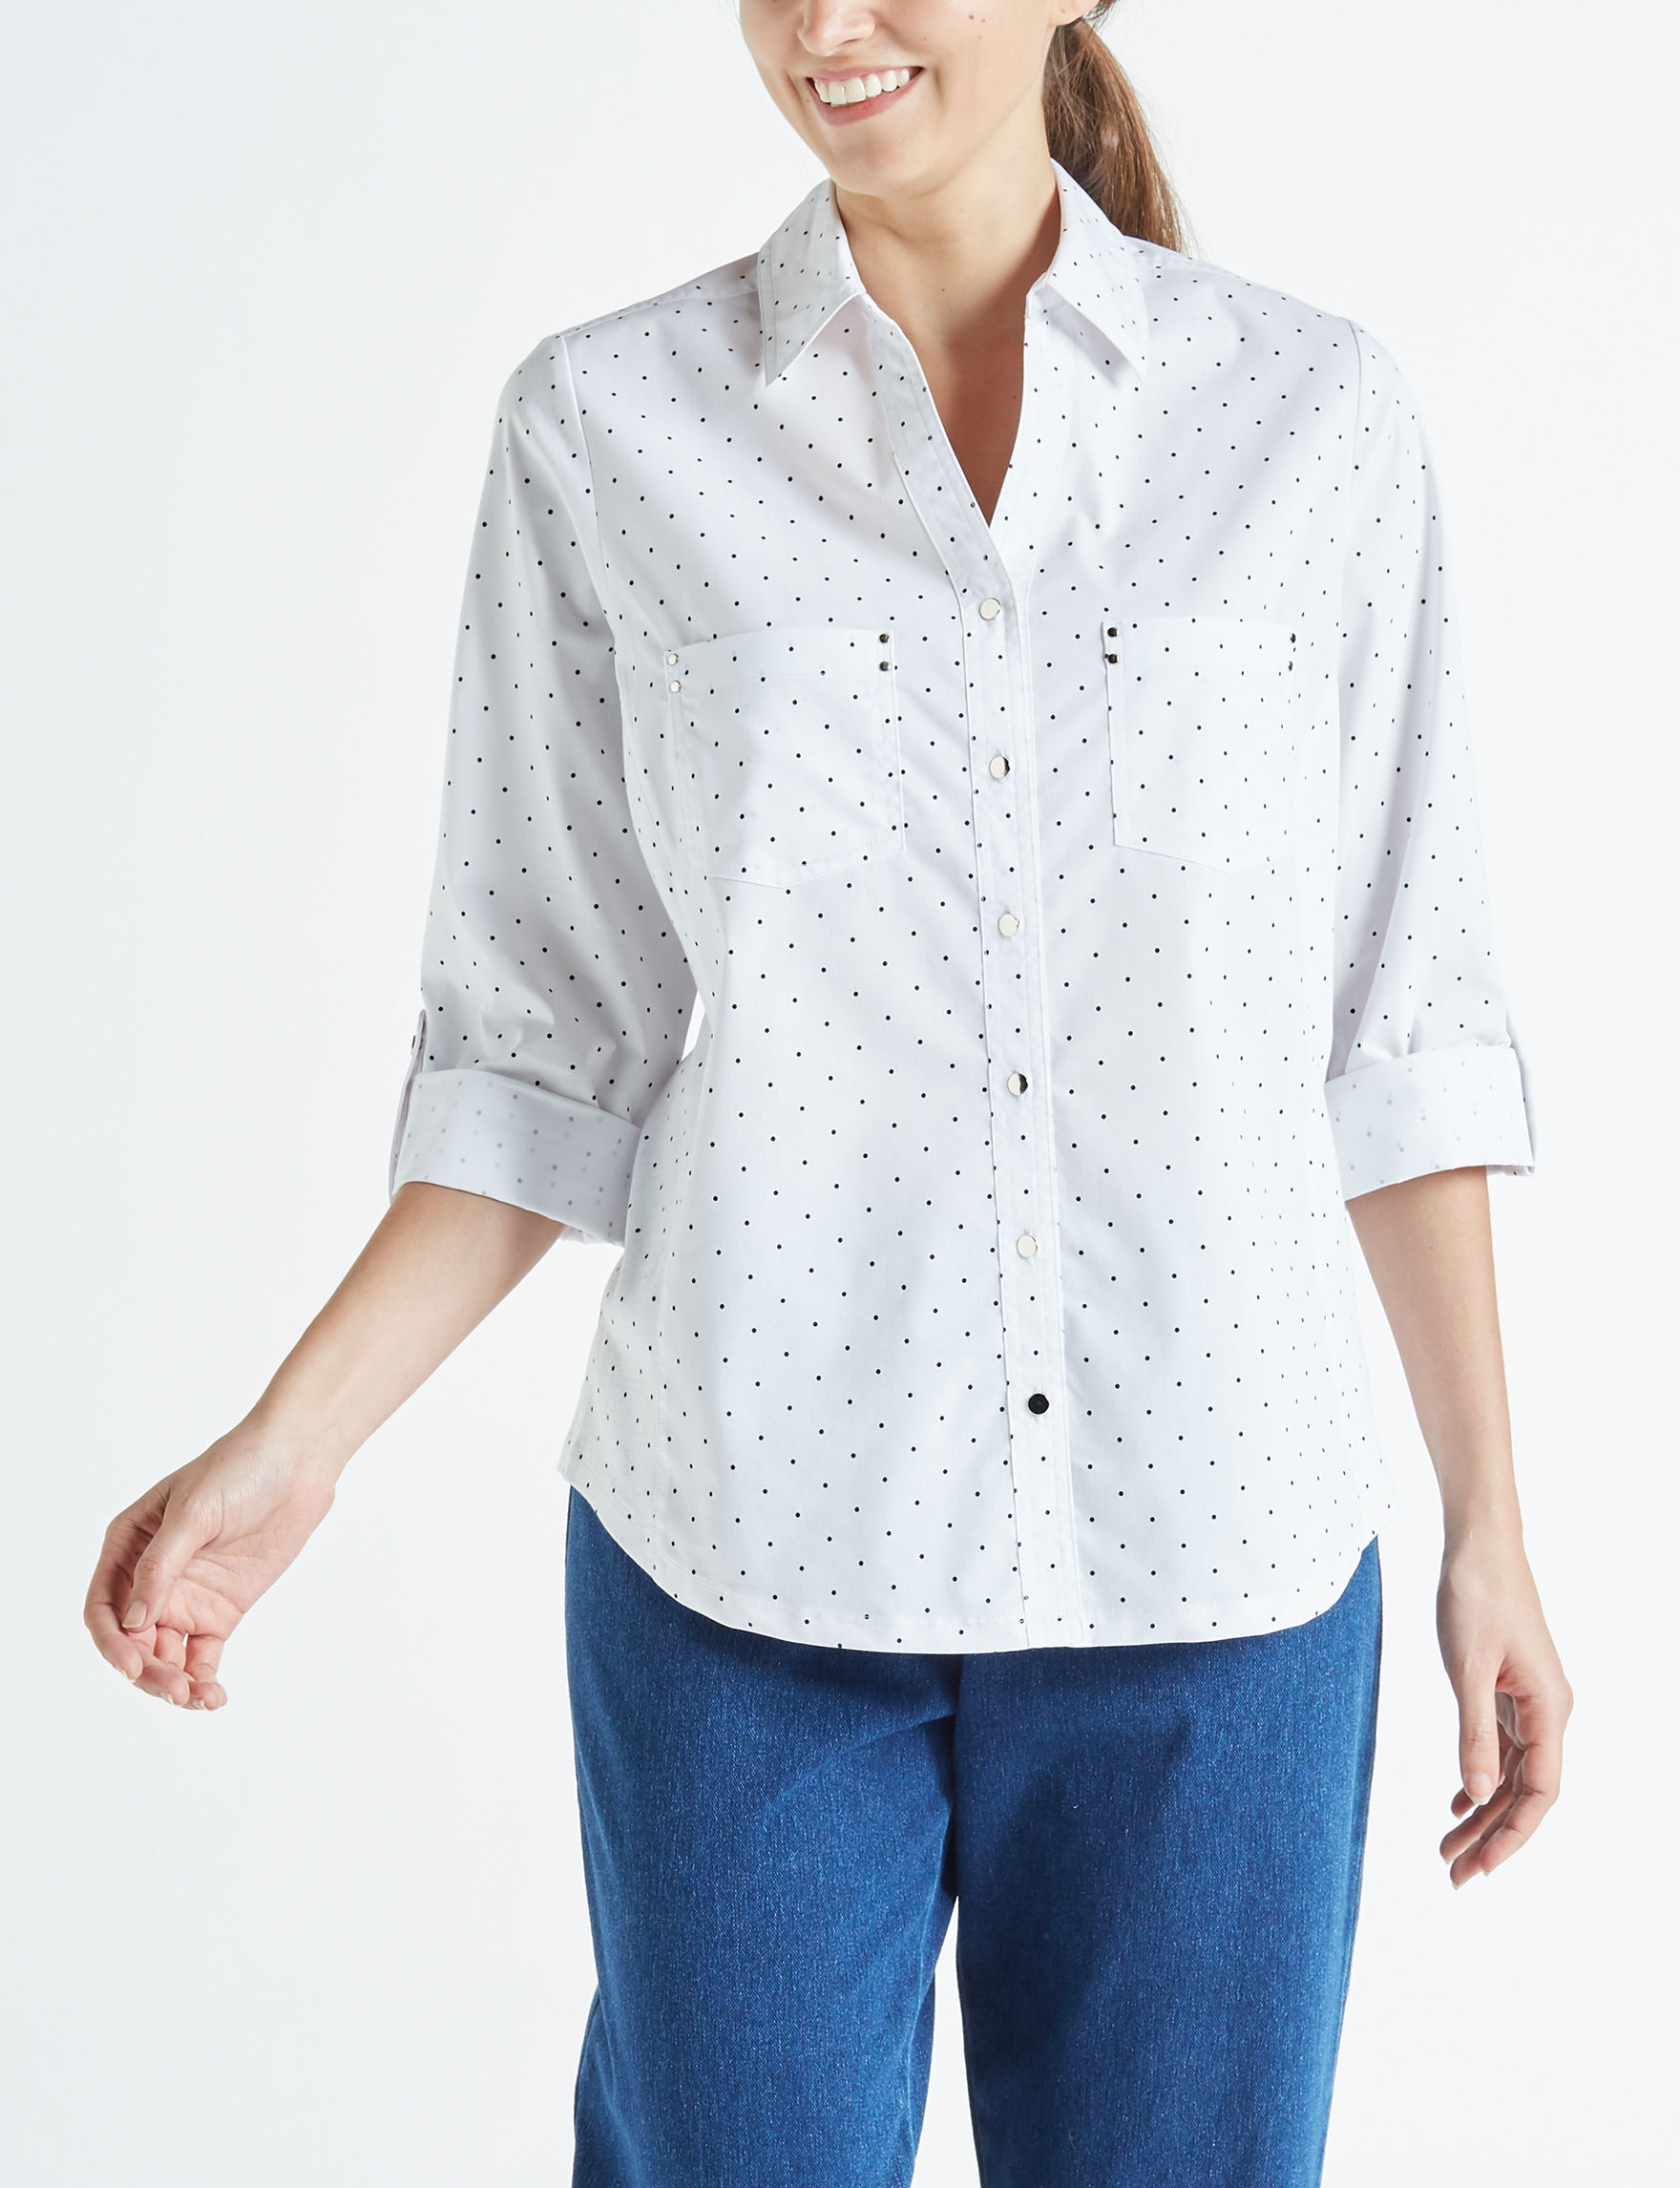 Cathy Daniels White / Black Shirts & Blouses